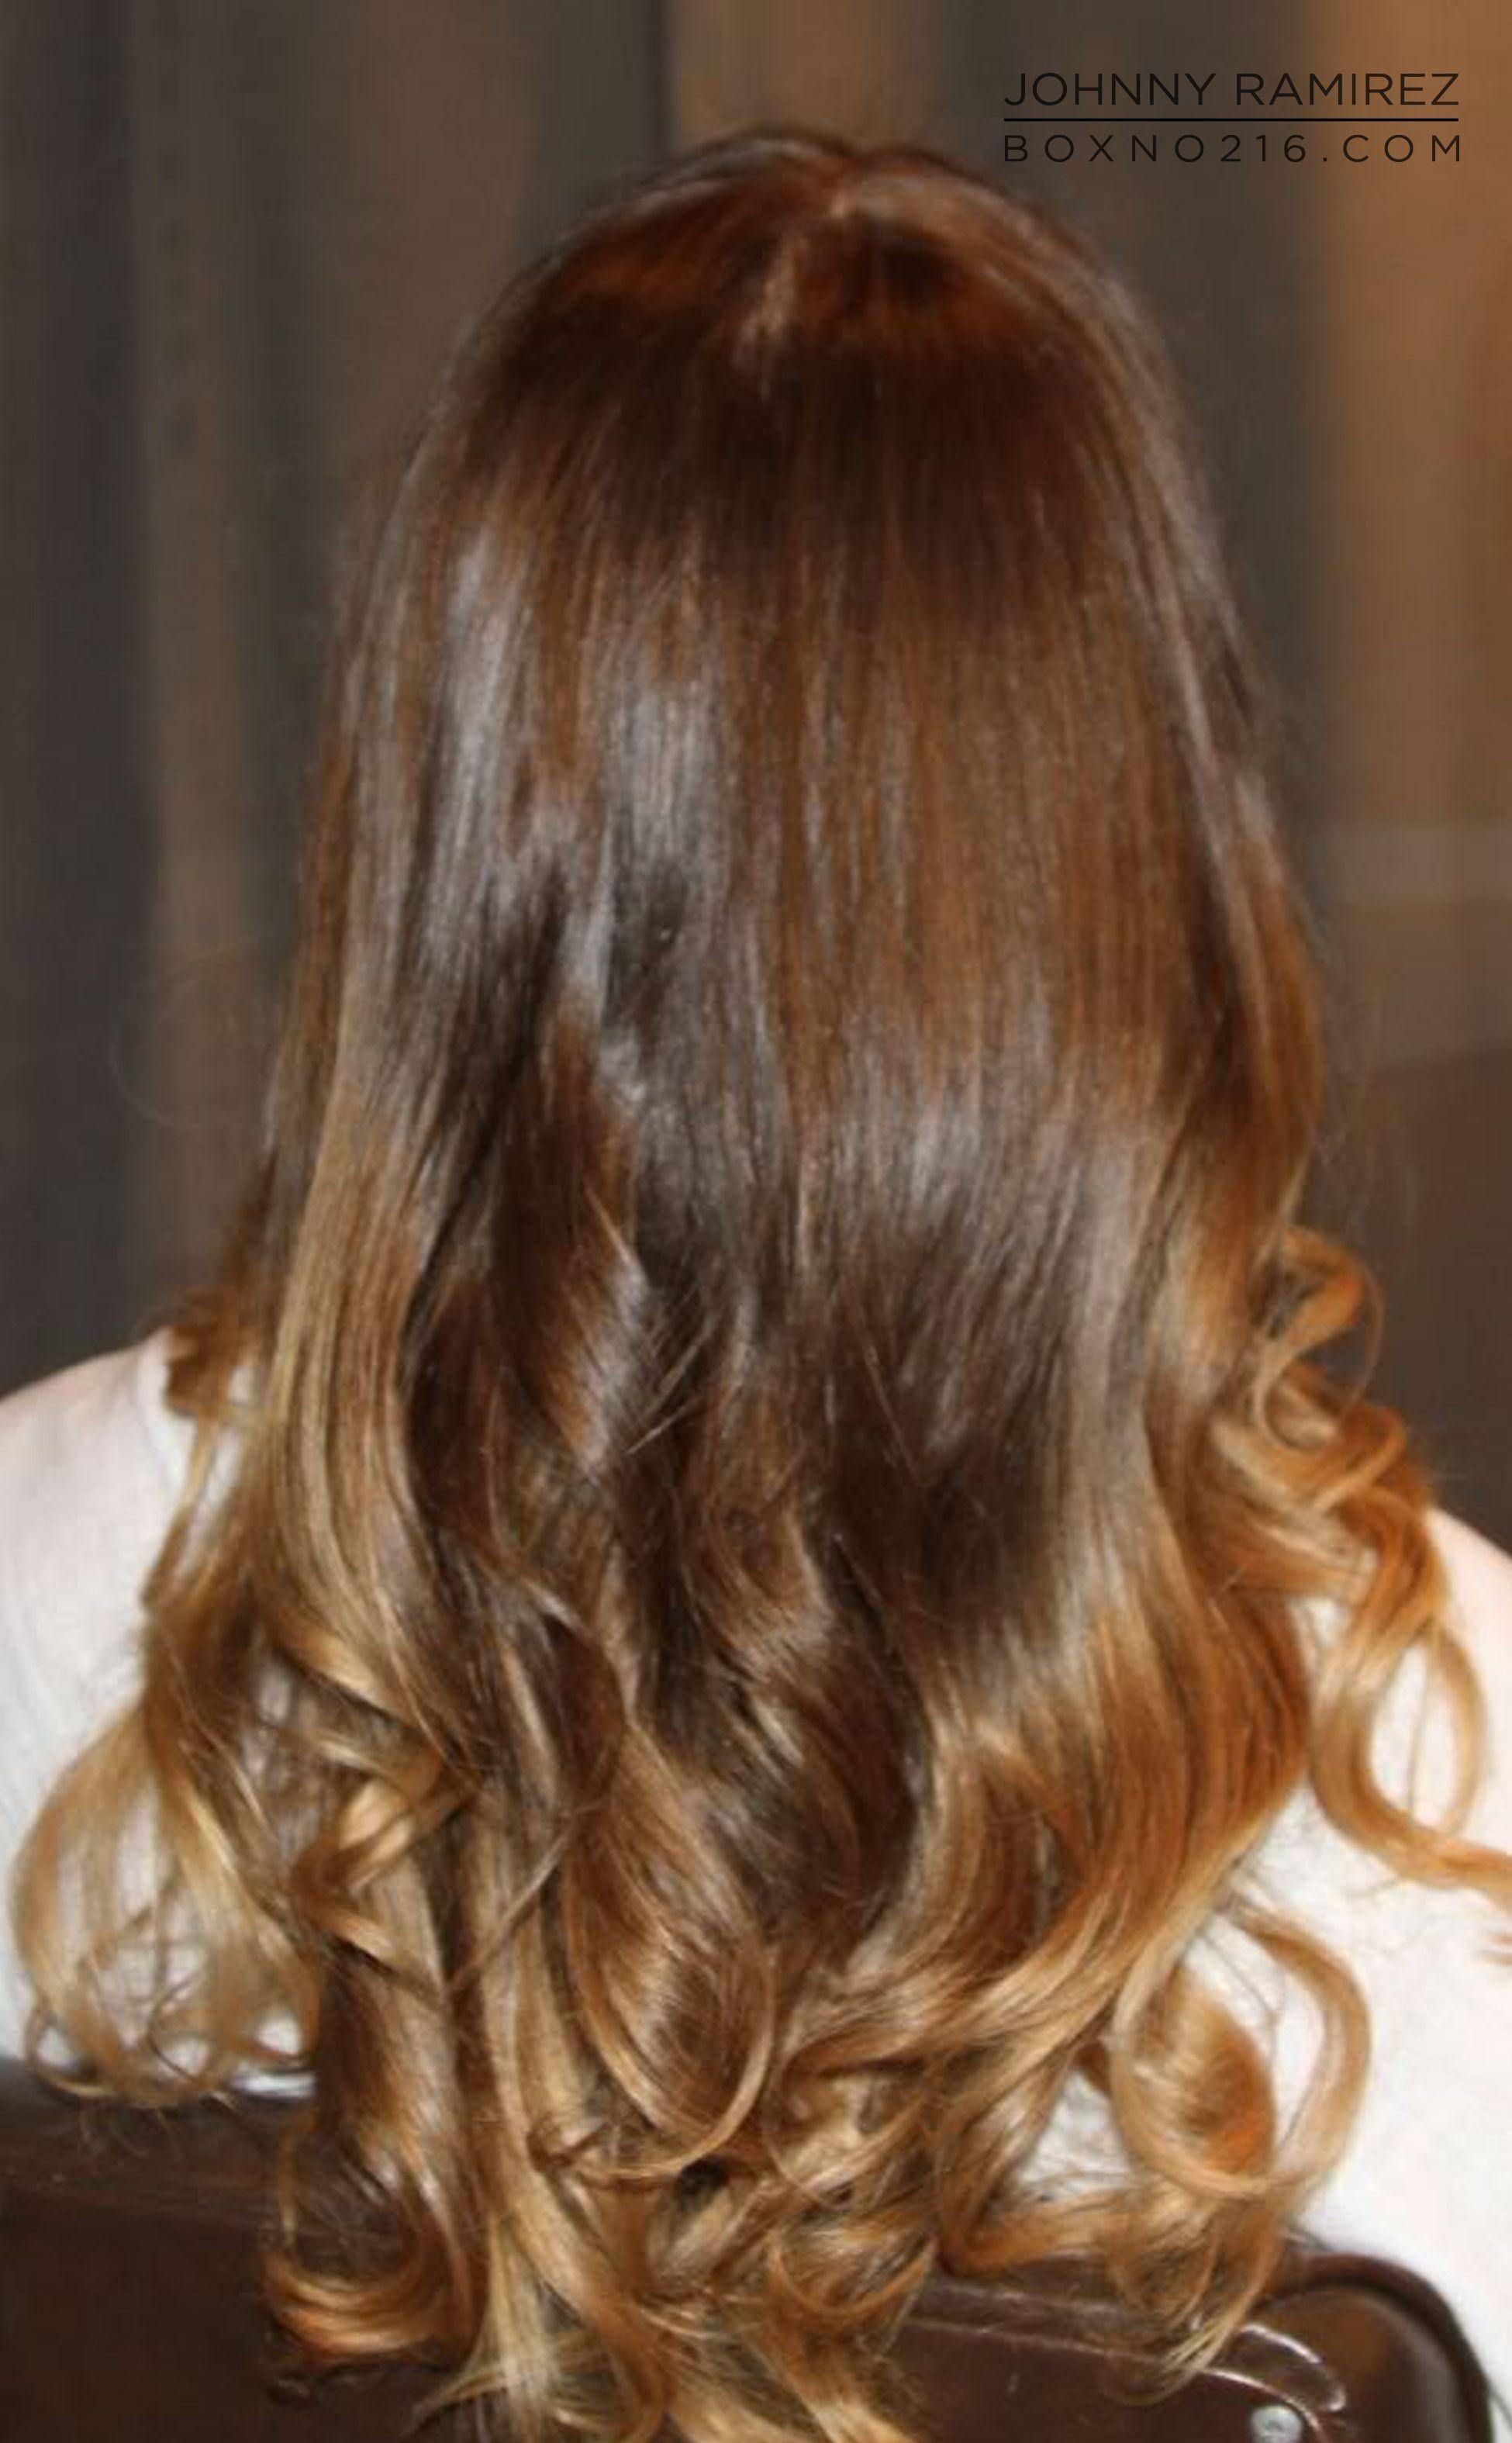 Box No. 216 Color By Johnny Ramirez For appointments: mailto:johnnyramirezcolor@gmail.com or call 310-775-561 #bestsalon #hair #beverlyhills #johnnyramirez #haircolor #colorist